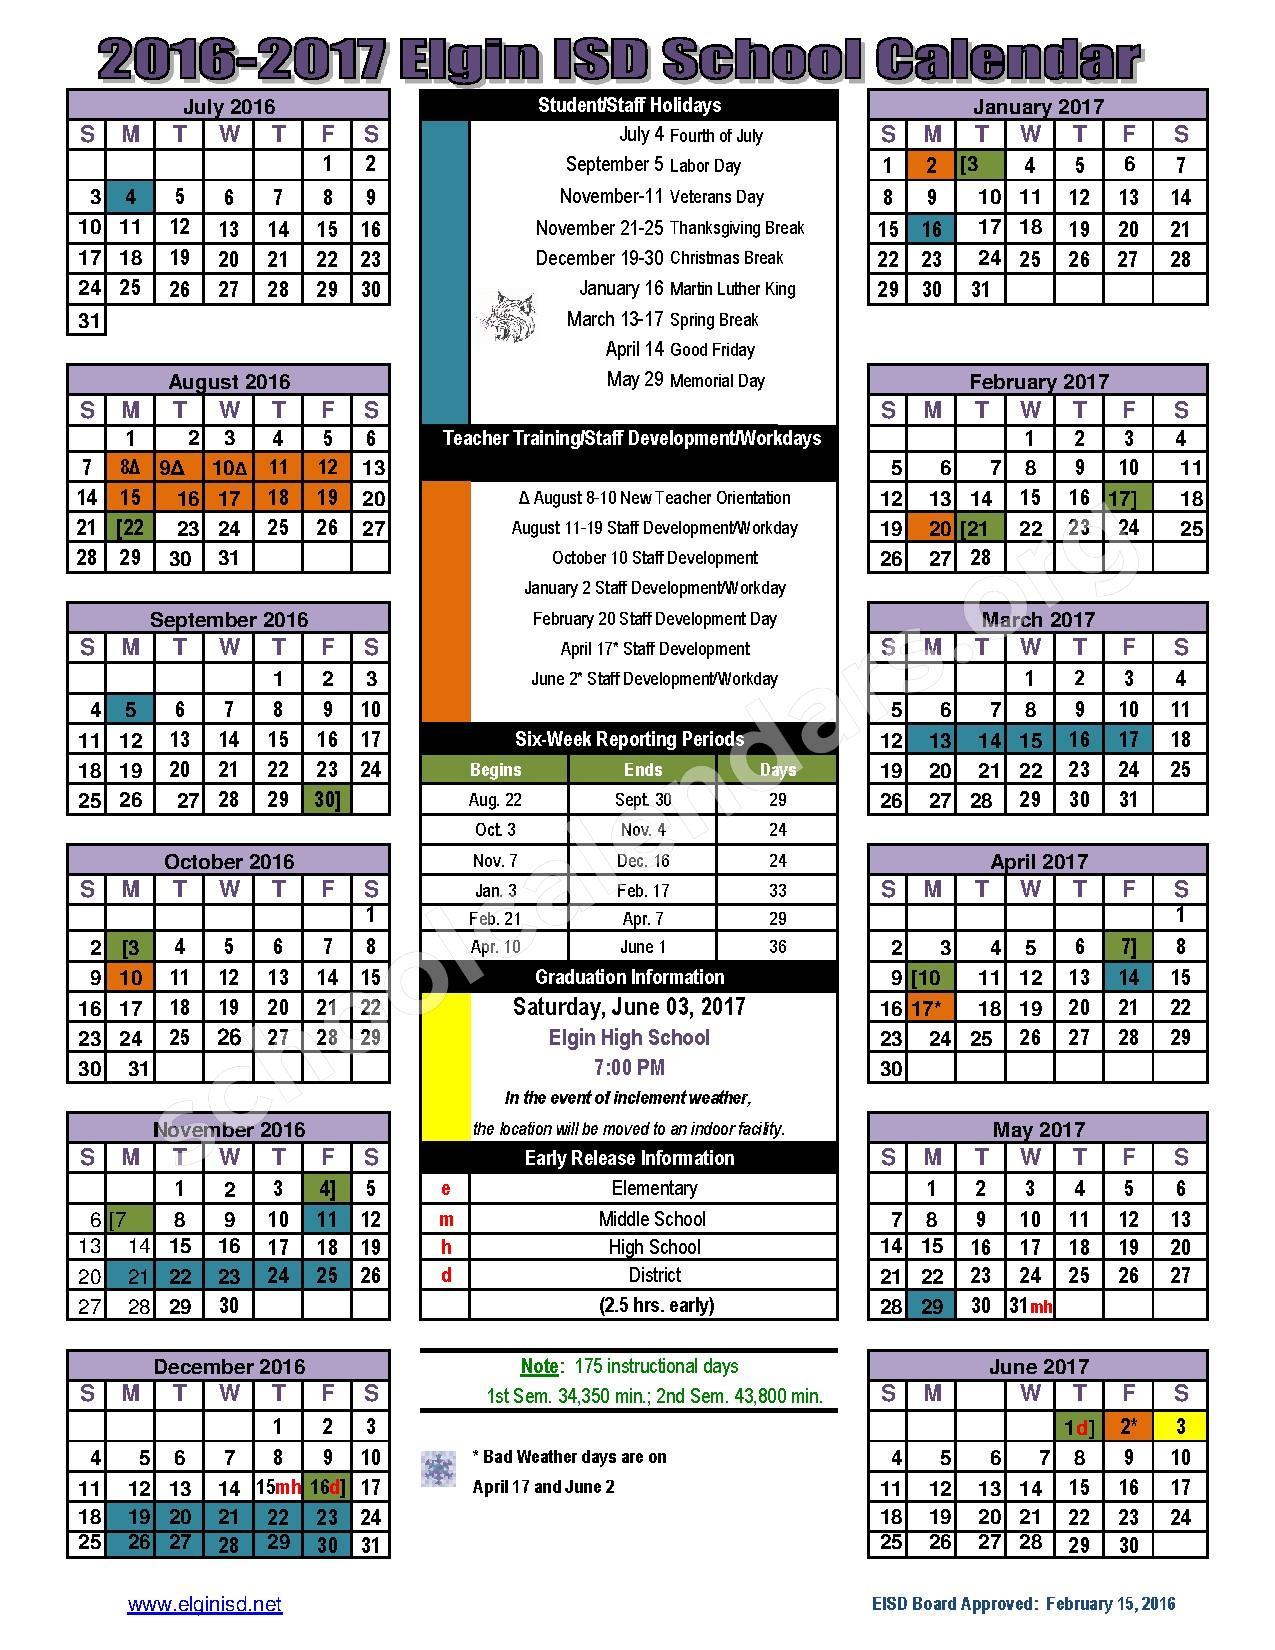 2016 - 2017 District calendar – Elgin Independent School District – page 1